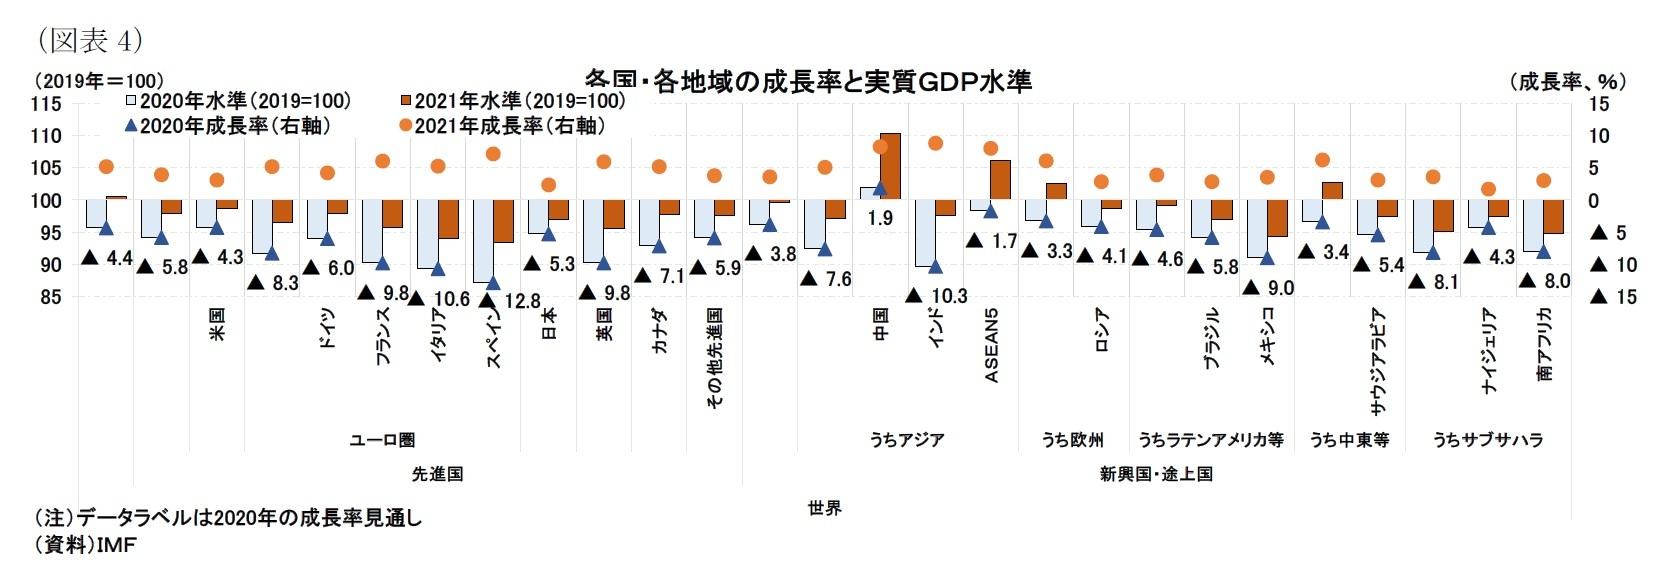 (図表4)各国・各地域の成長率と実質GDP水準